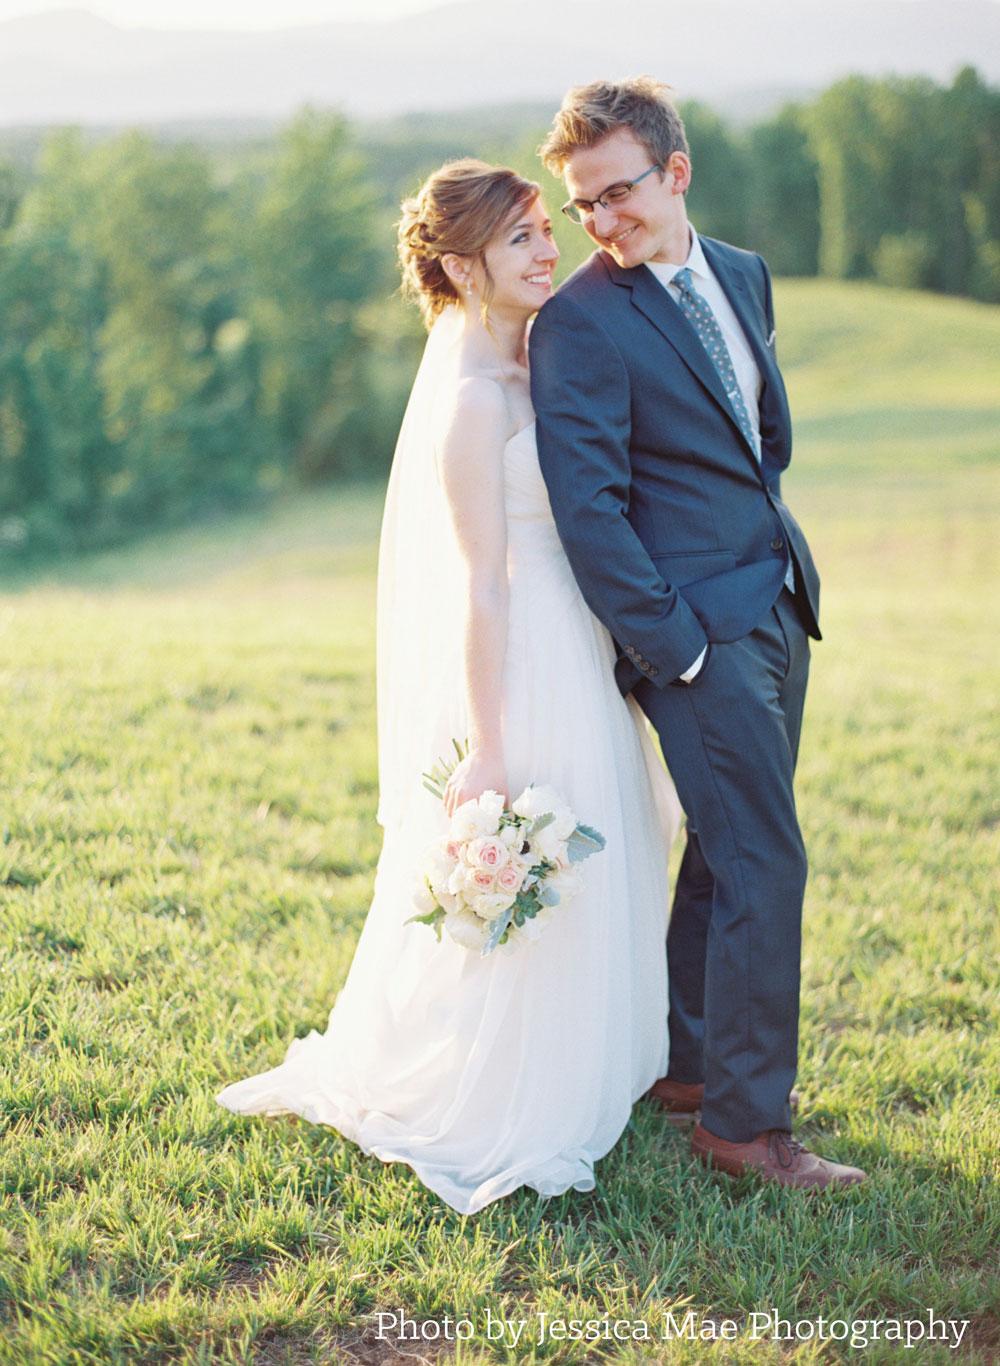 Wedding portrait by Jessica Mae Photography, Lynchburg, VA